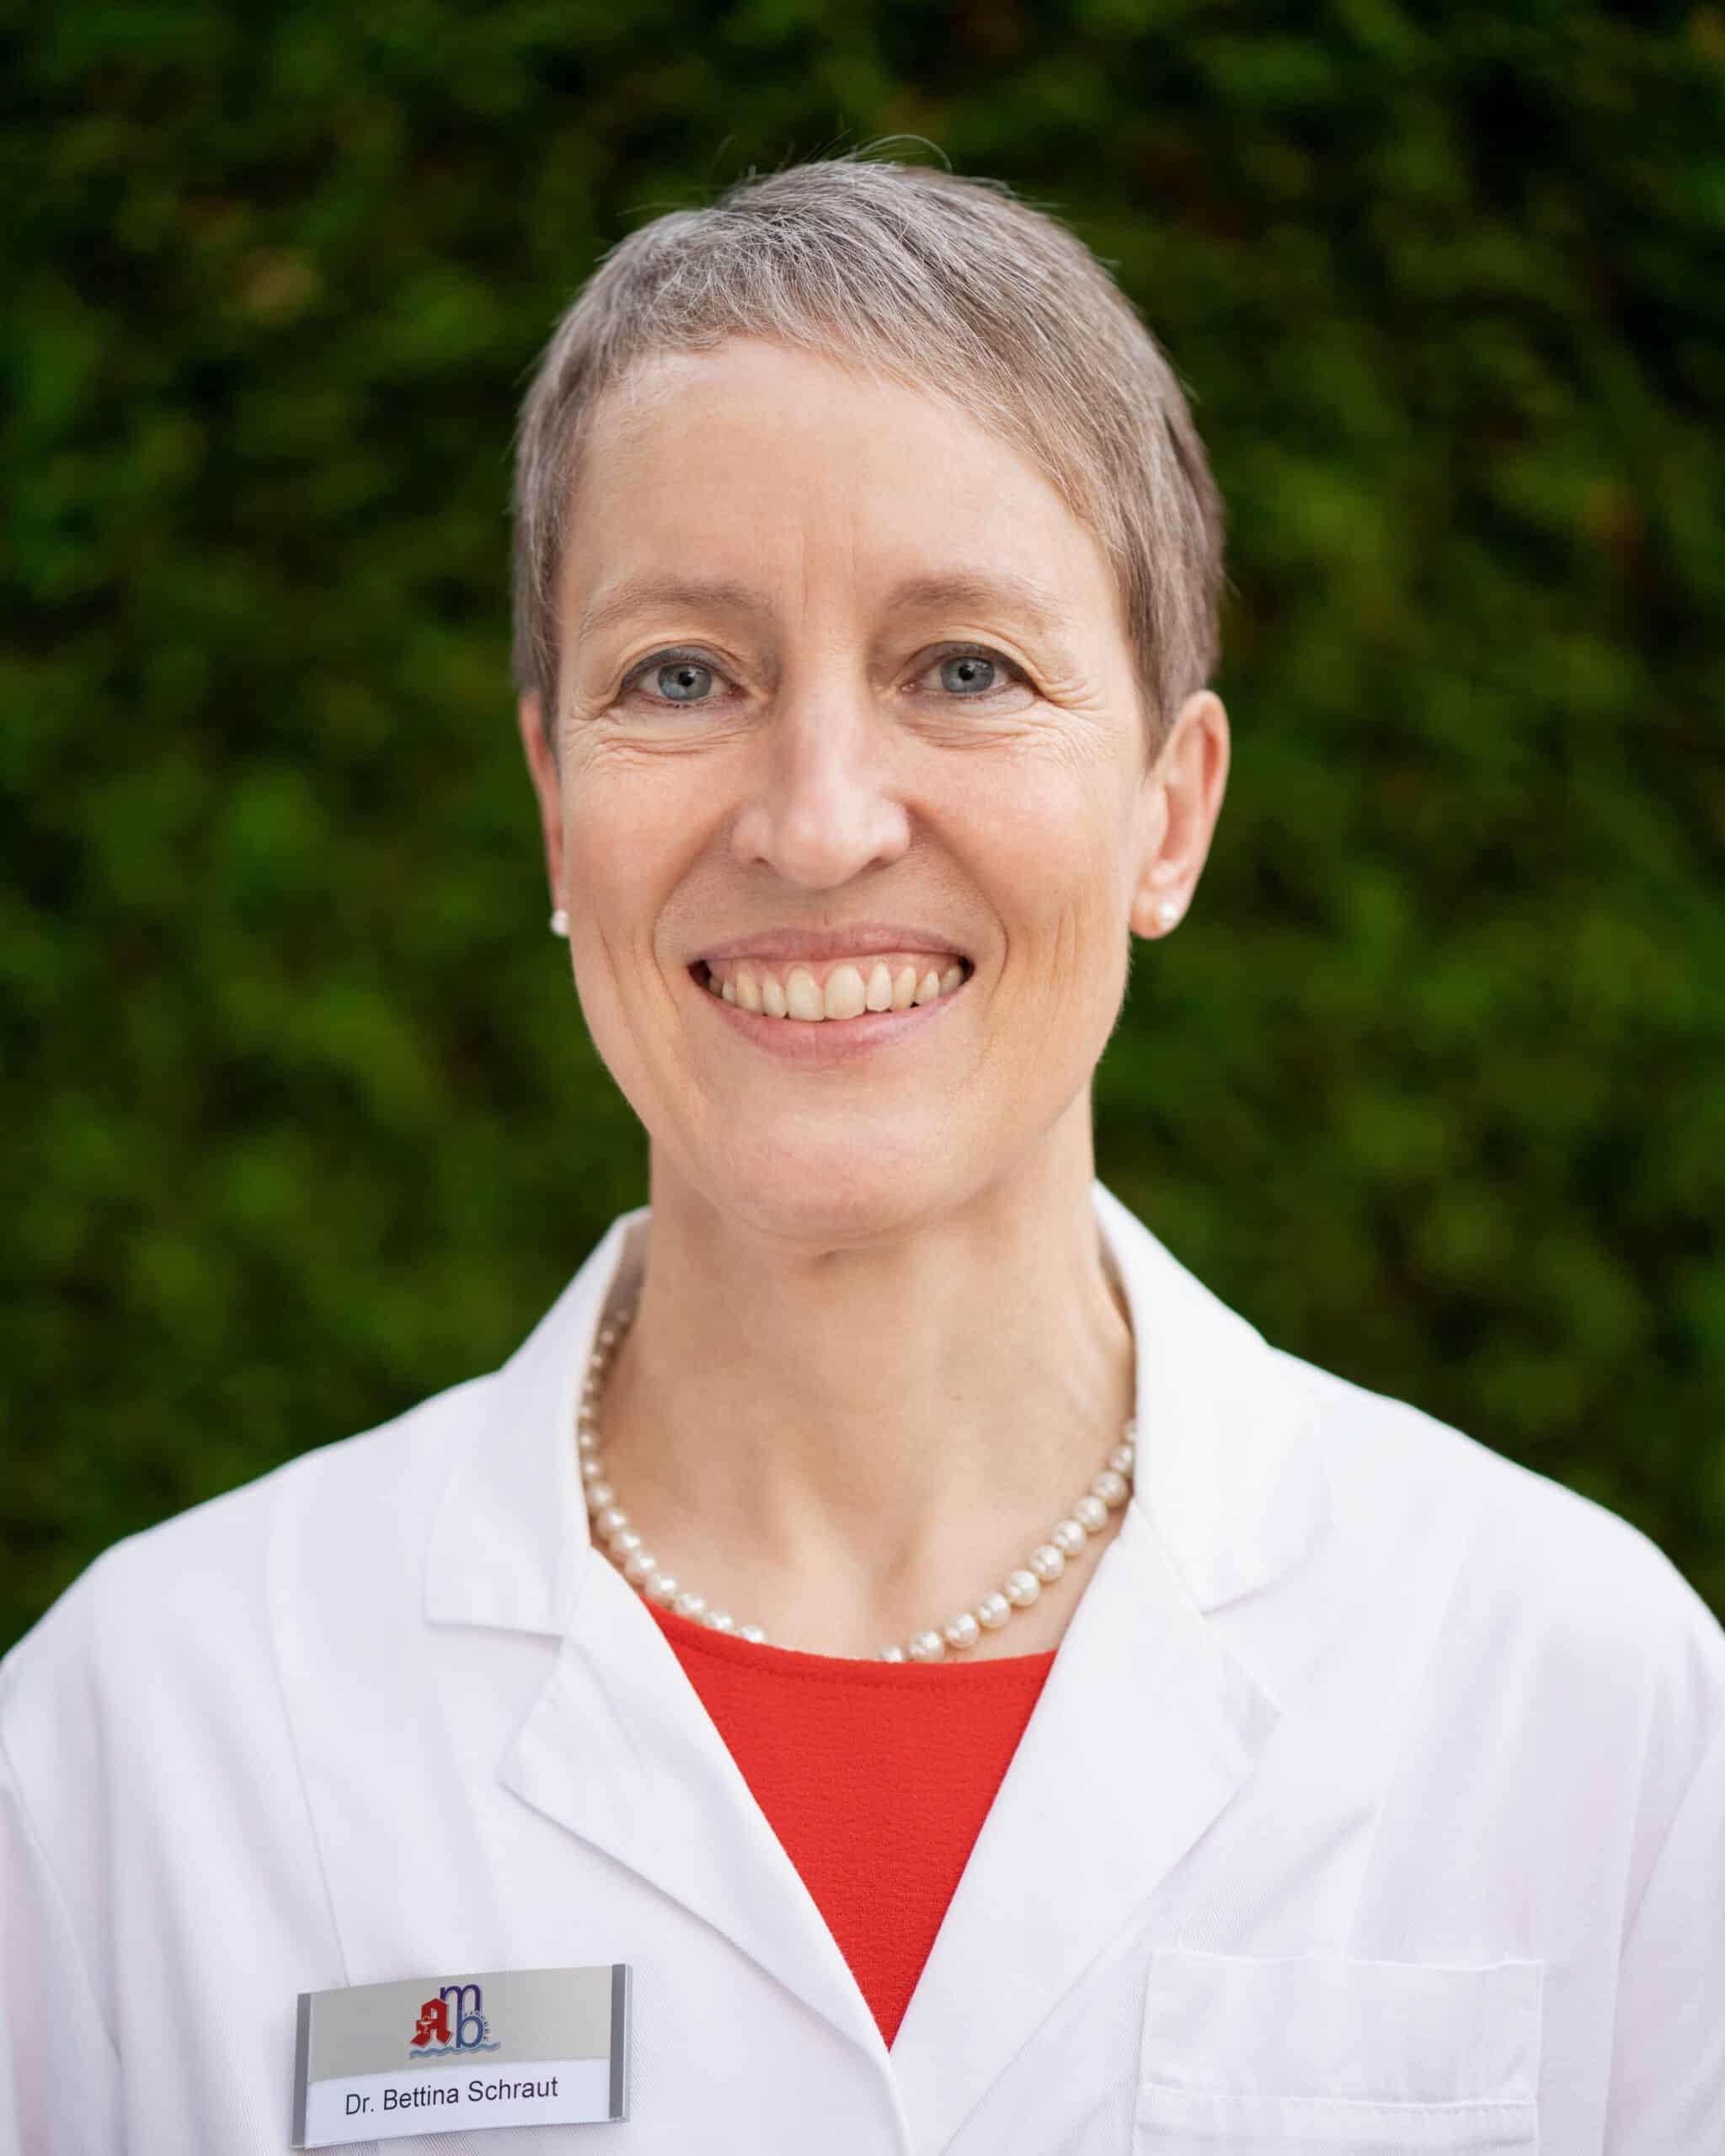 Frau Dr. Bettina Schraut (Apothekerin)